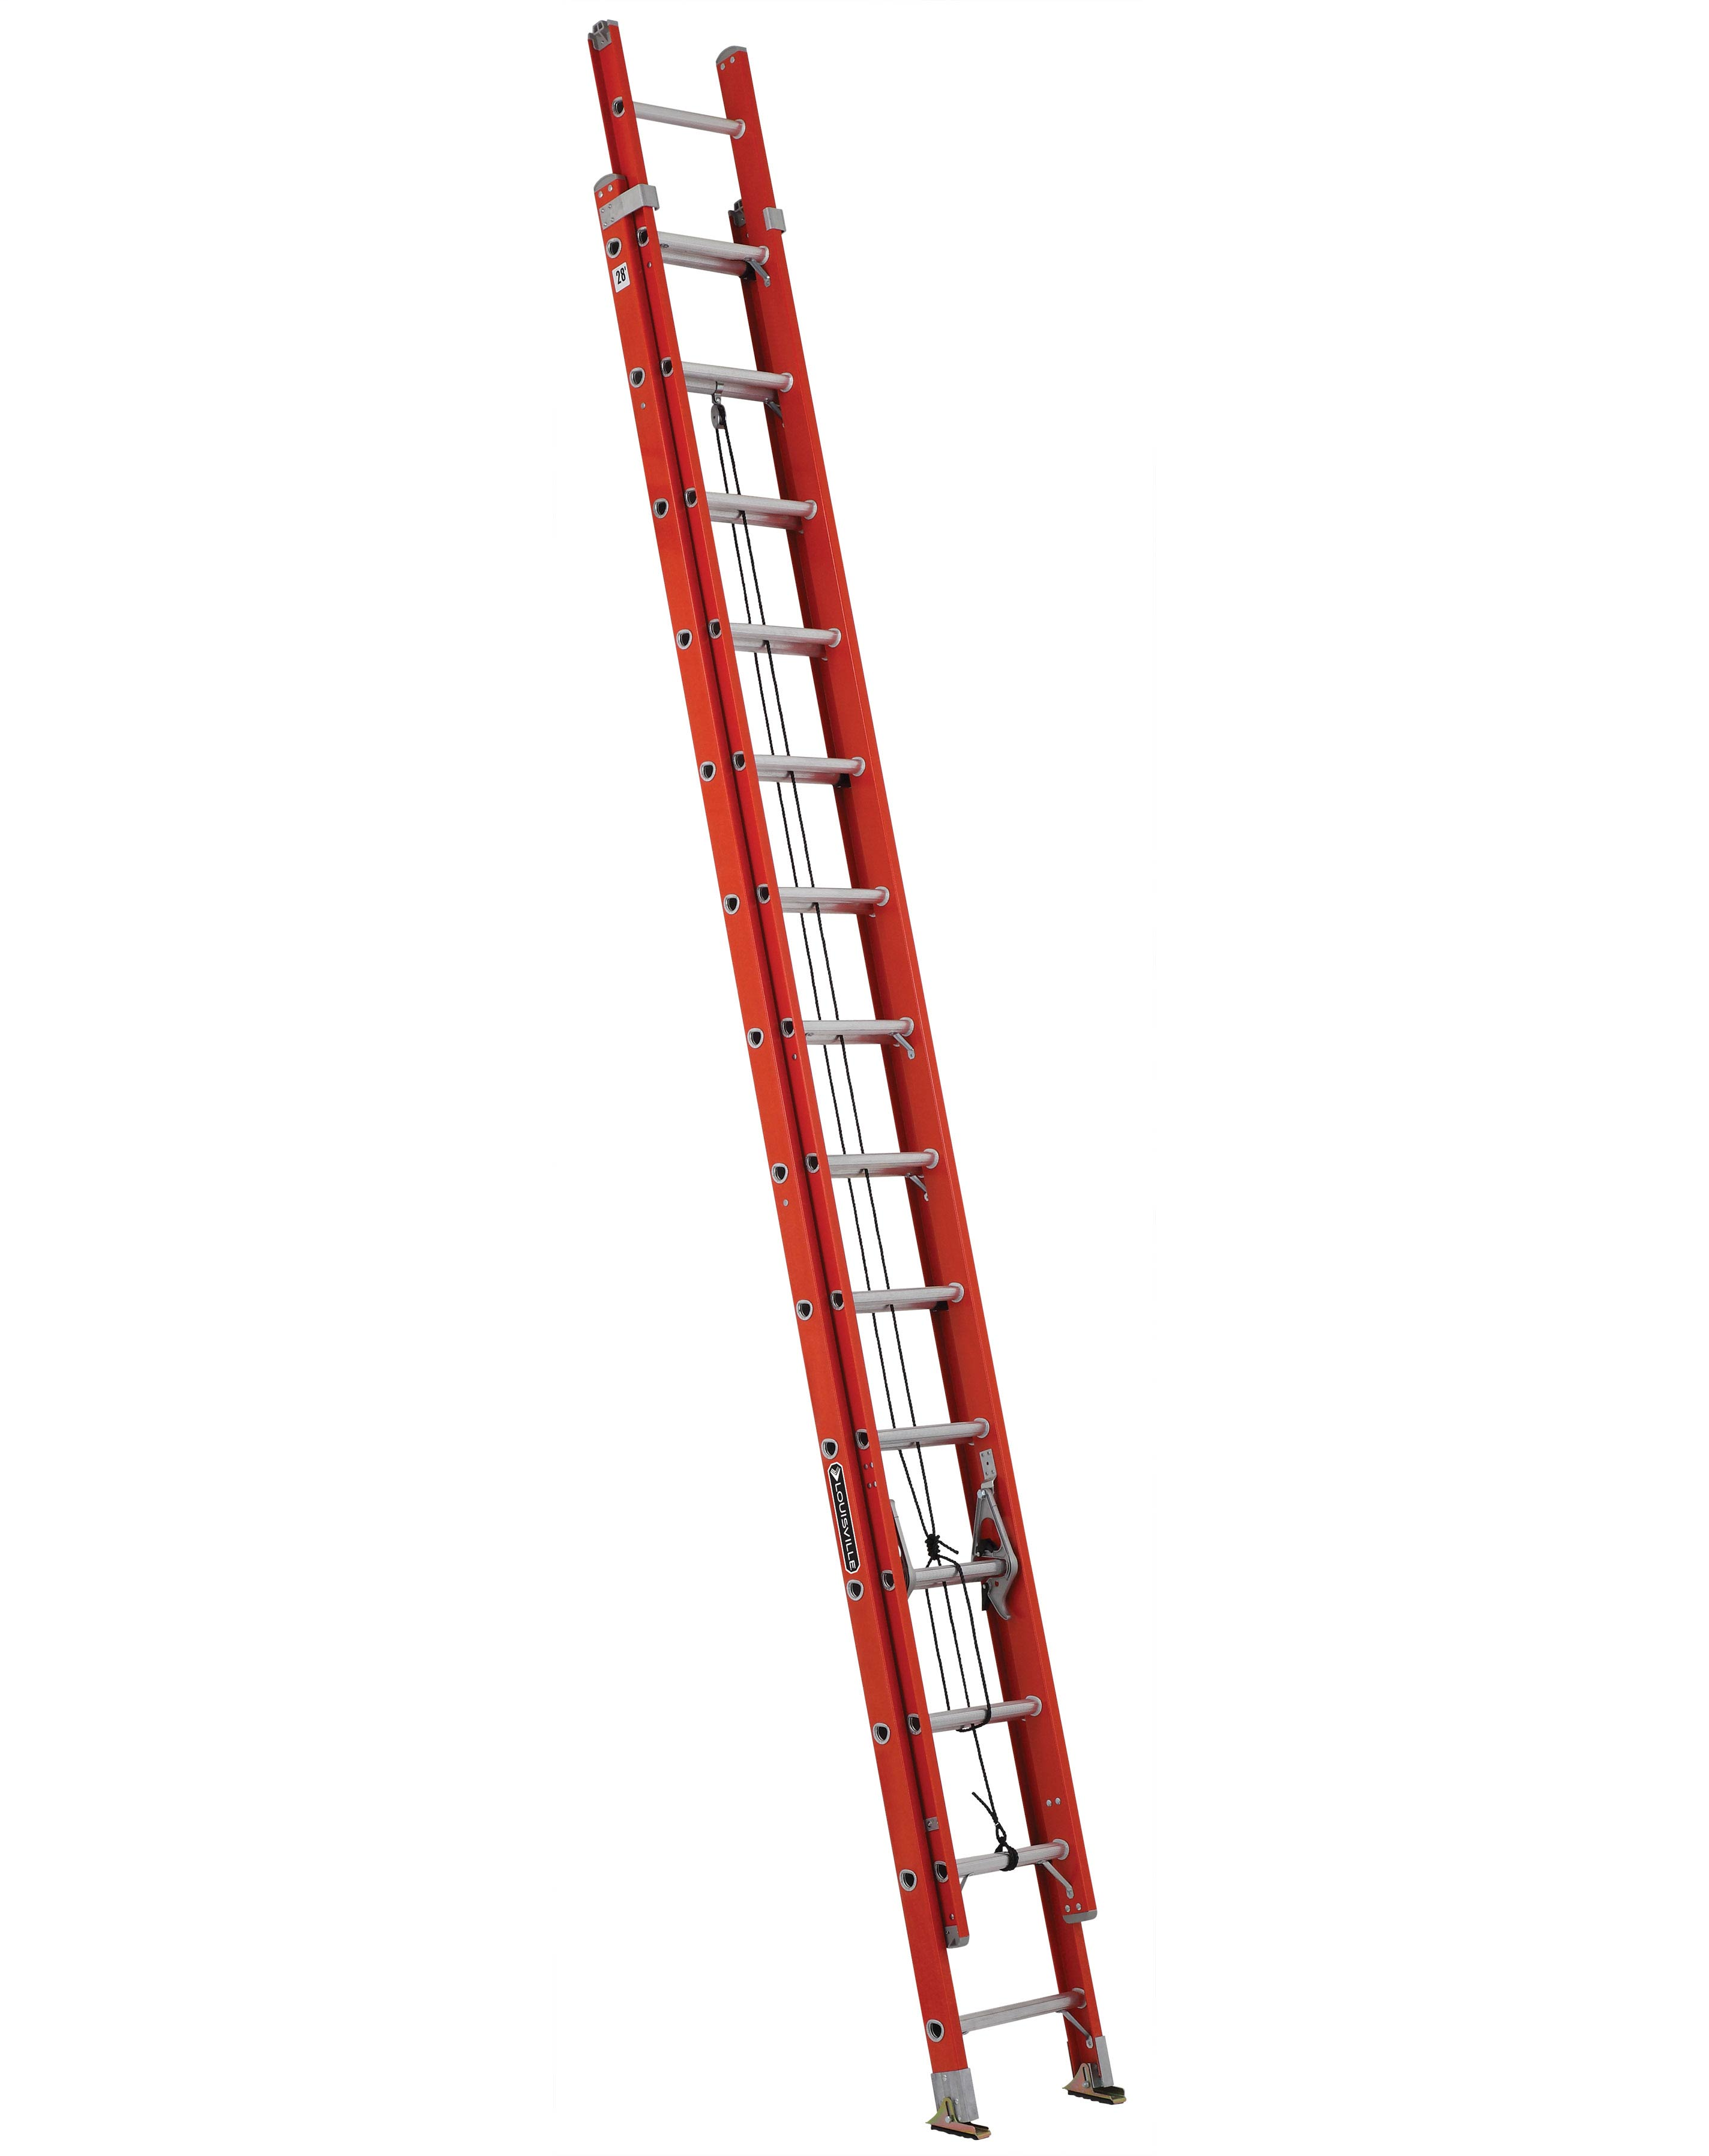 LOUISVILLE LADDERS 28 ft Fiberglass Multi-section Extension Ladders